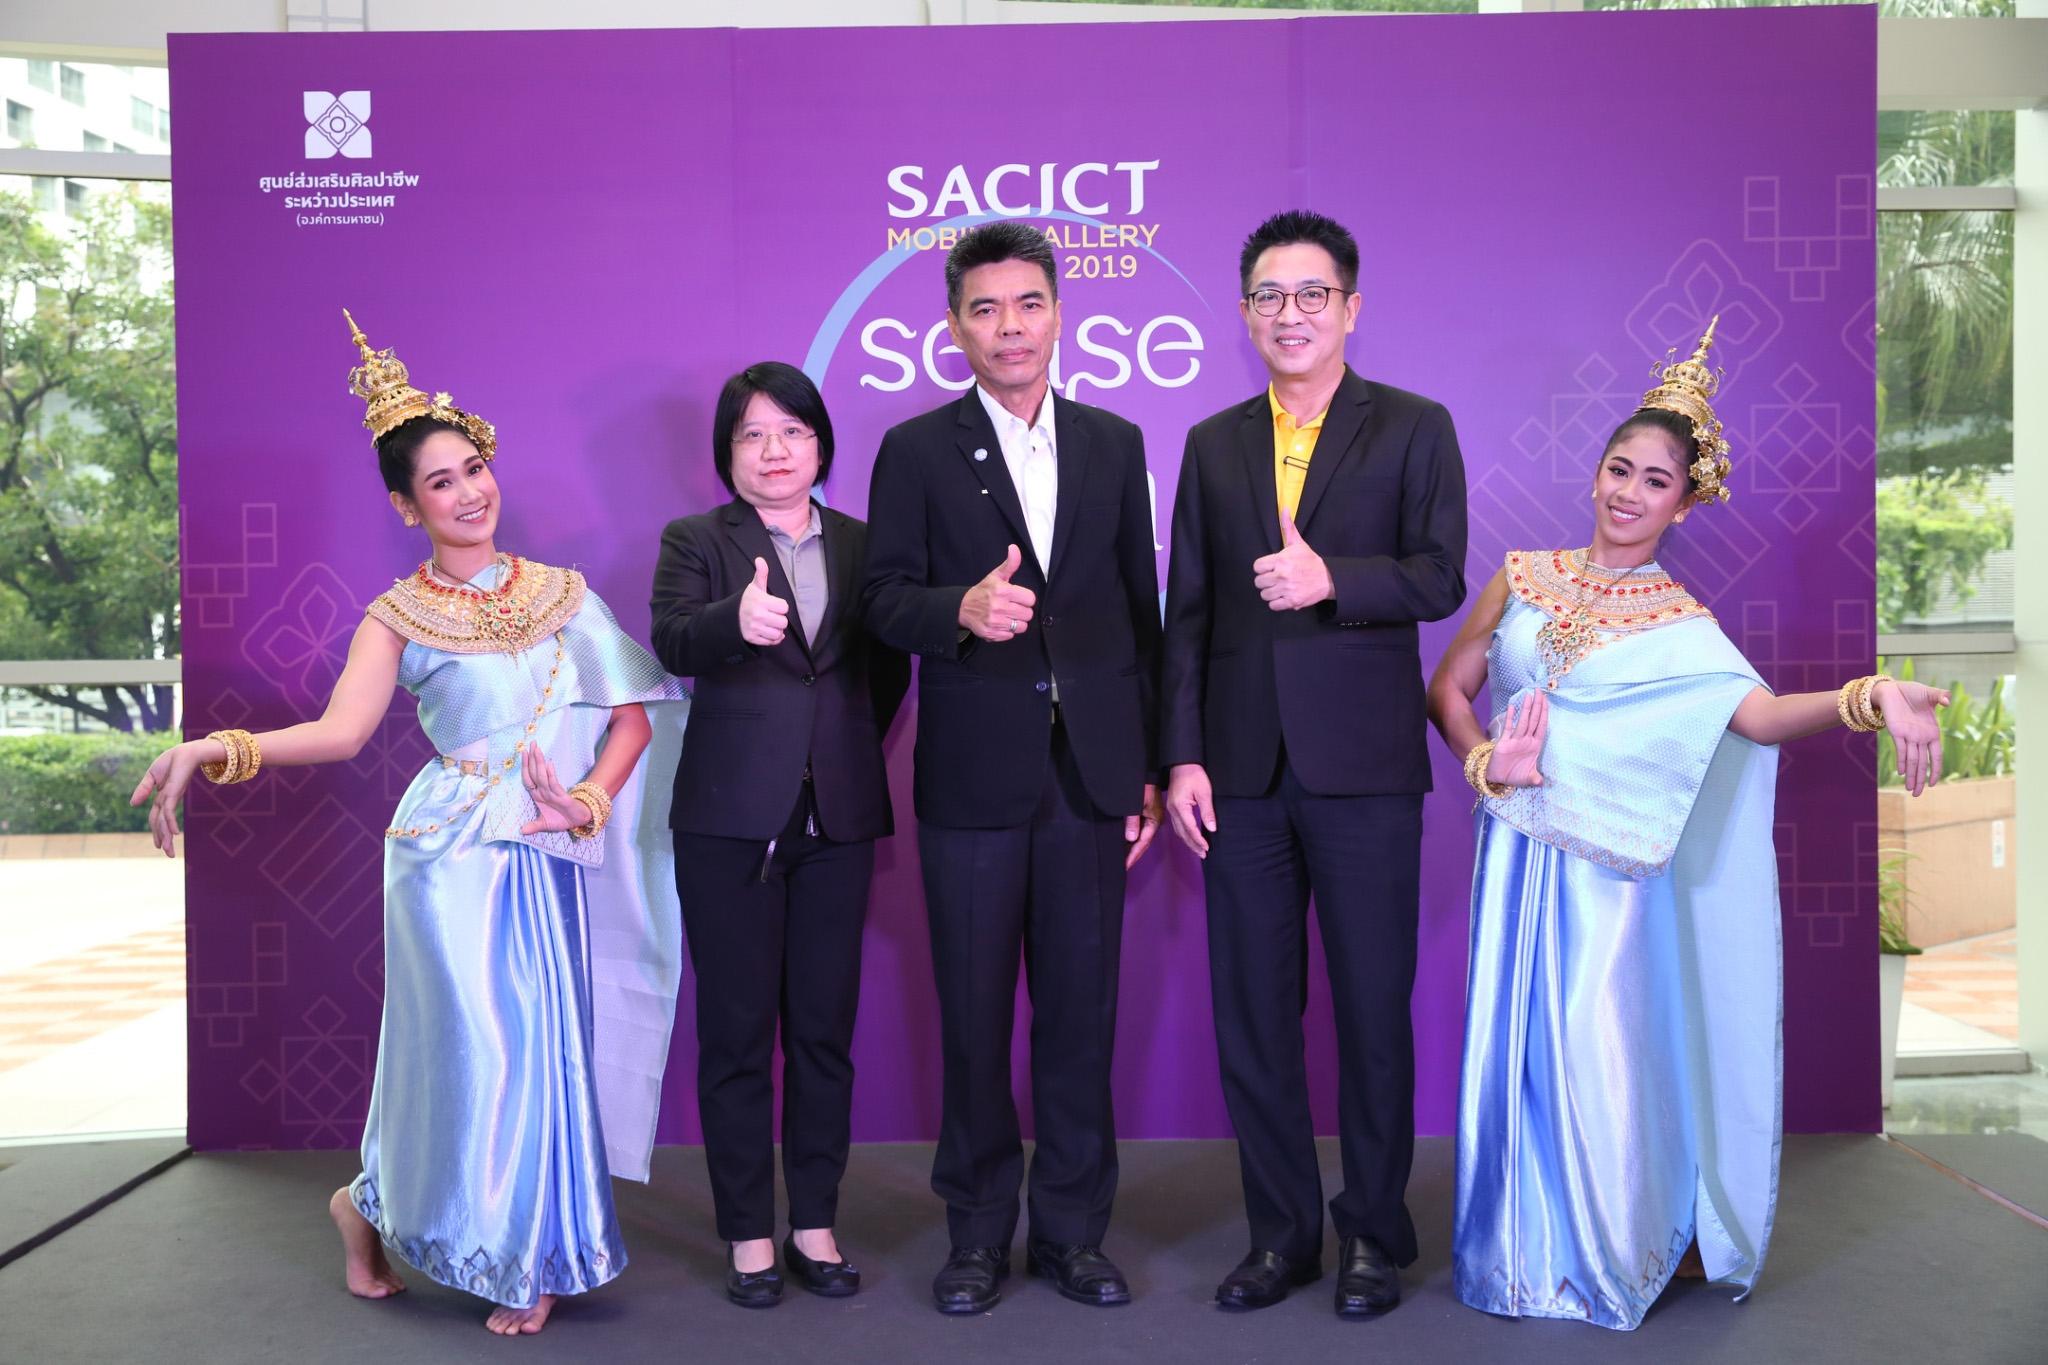 "SACICT สานต่องาน ""SACICT Mobile Gallery 2019"" ครั้งที่ 3"